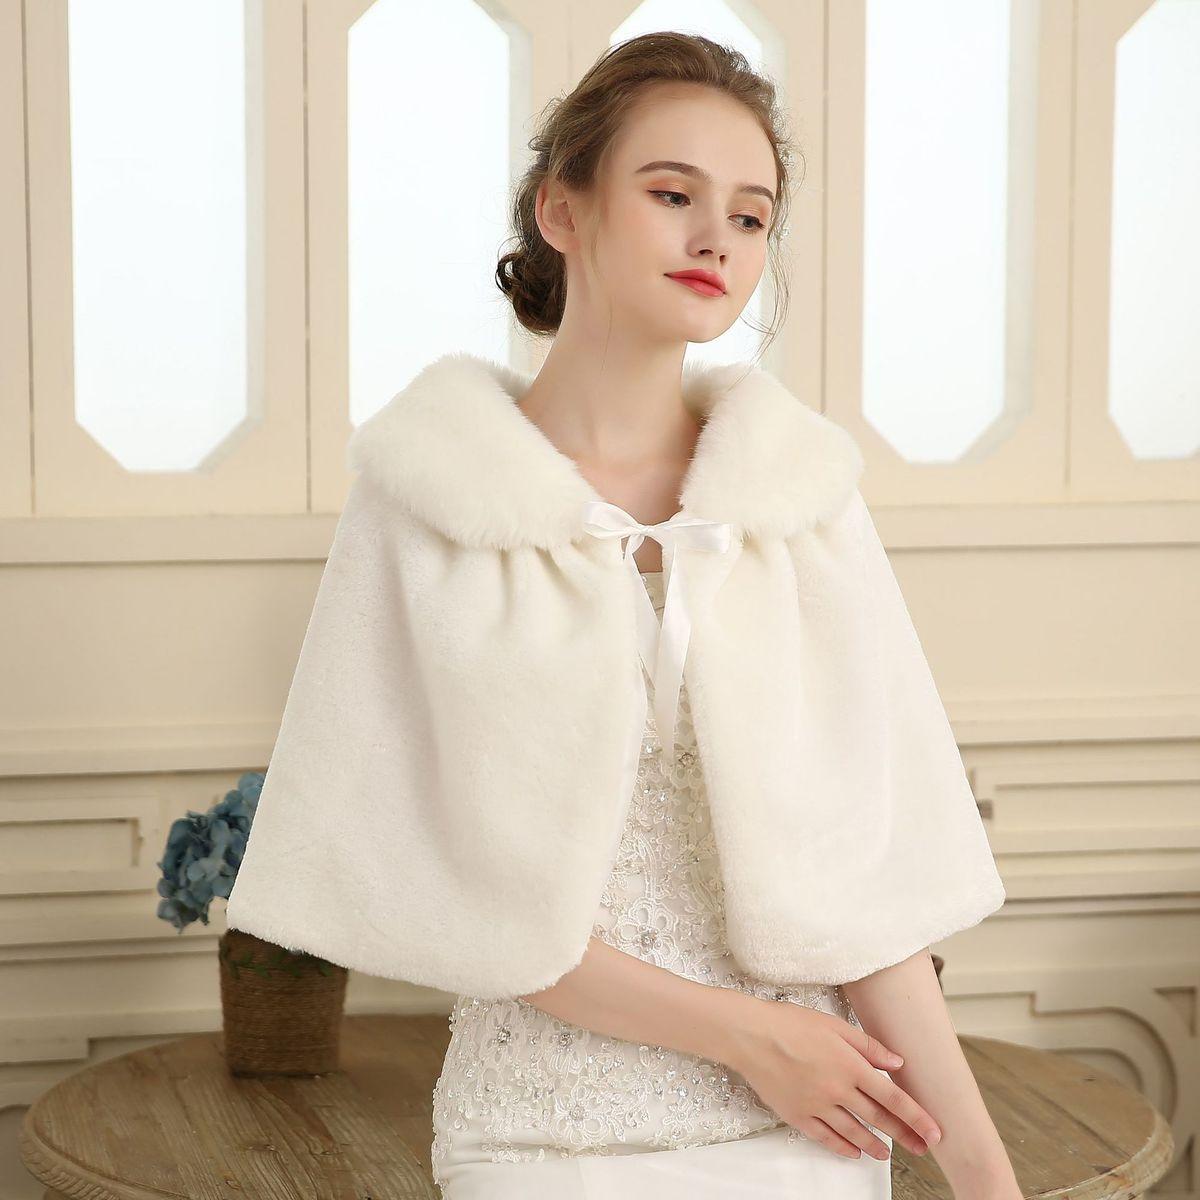 Winter Spring Cheap Faux Fur Bridal Jacket Warm Boleros 2018 White Bride Wraps Cape Shrug Wedding Jacket Wedding Accessories